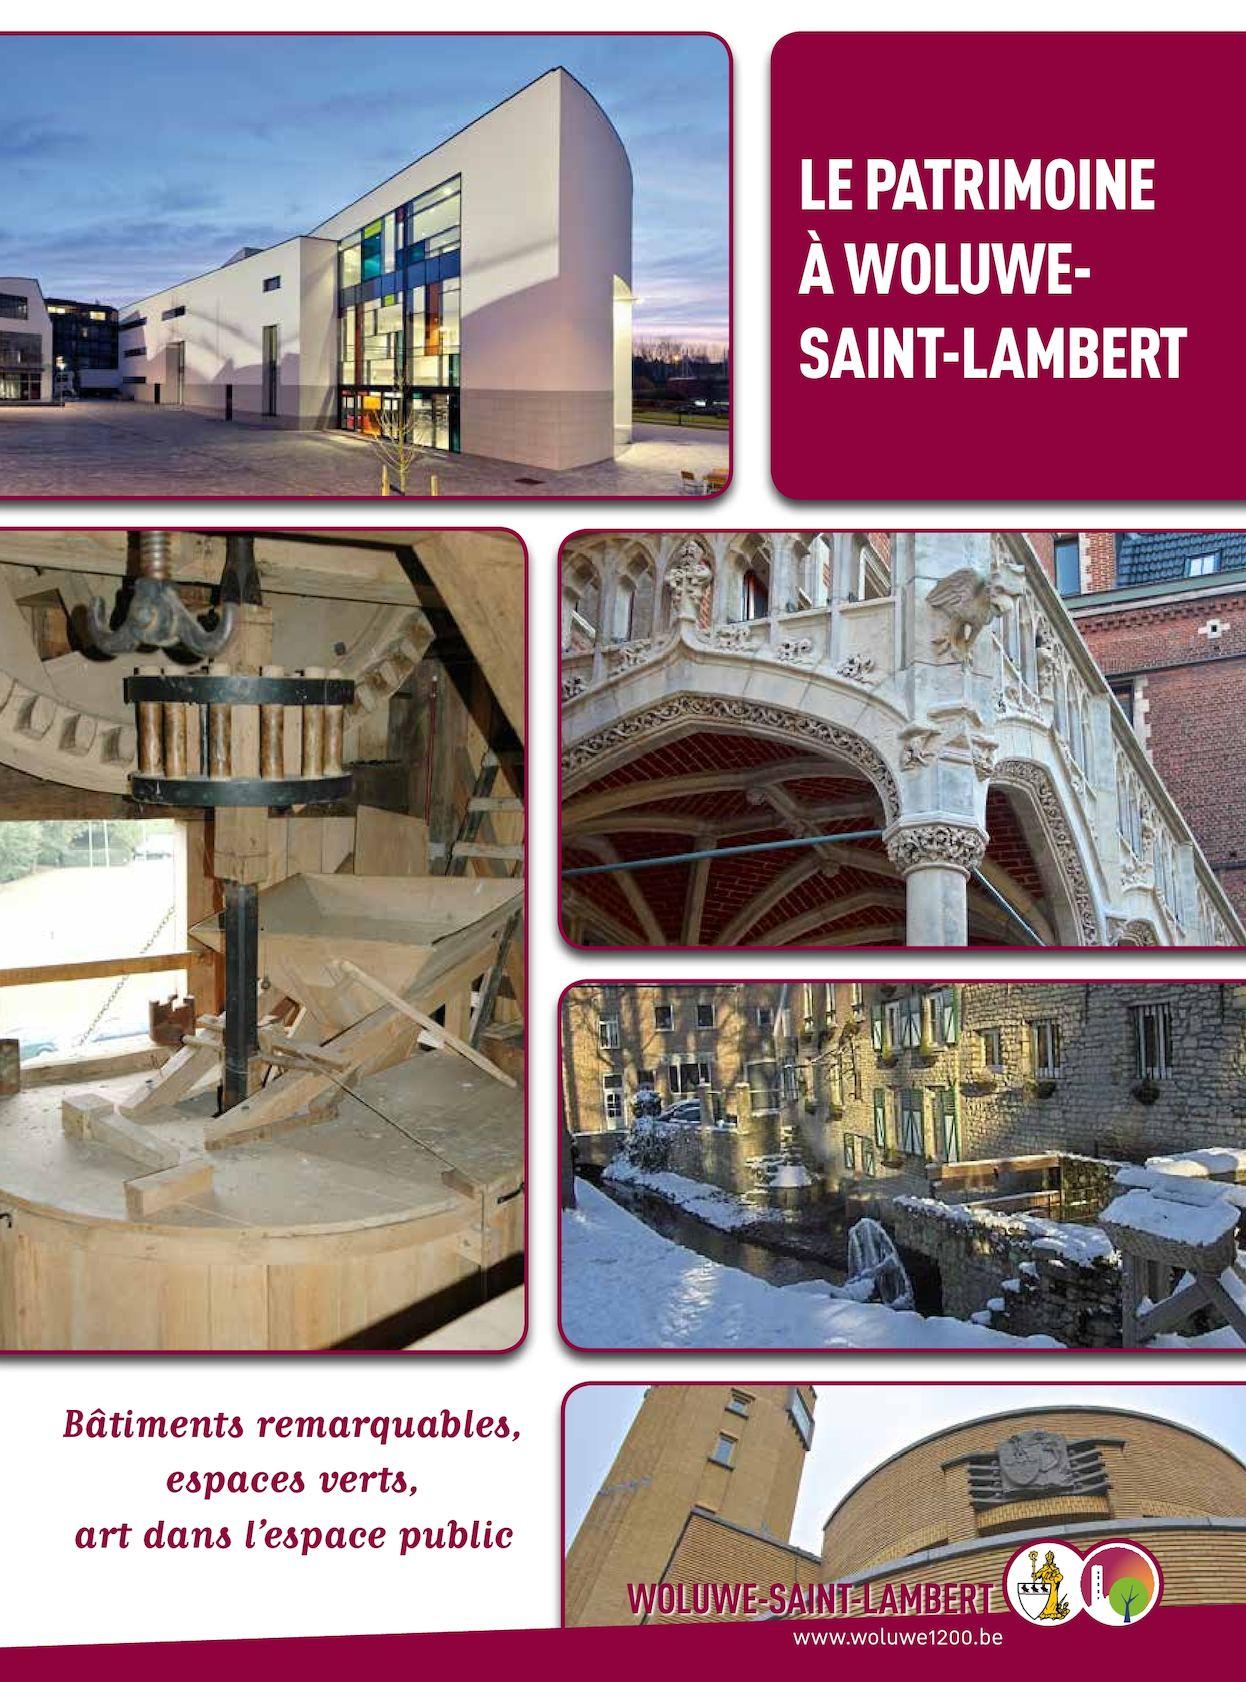 classement sites de rencontres 2013 woluwe saint lambert